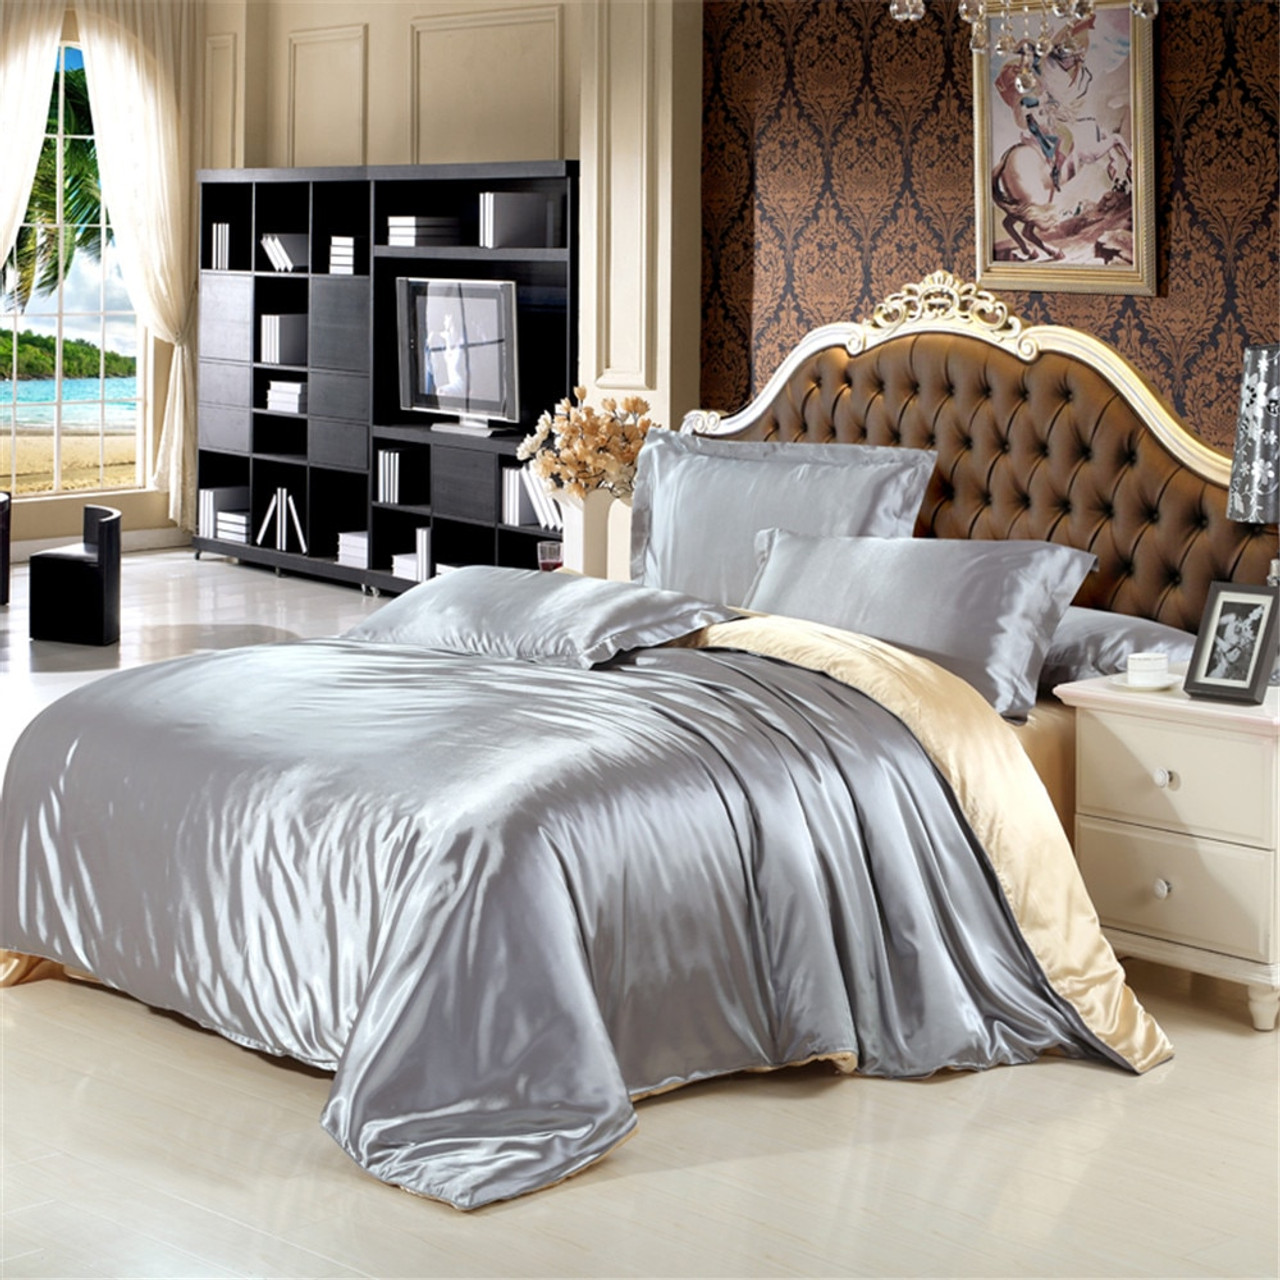 Home Garden Sheets King Size 4 Pcs Satin Silk Bedding Set Duvet Cover Fitted Sheet Pillow Cases Dailystyles De